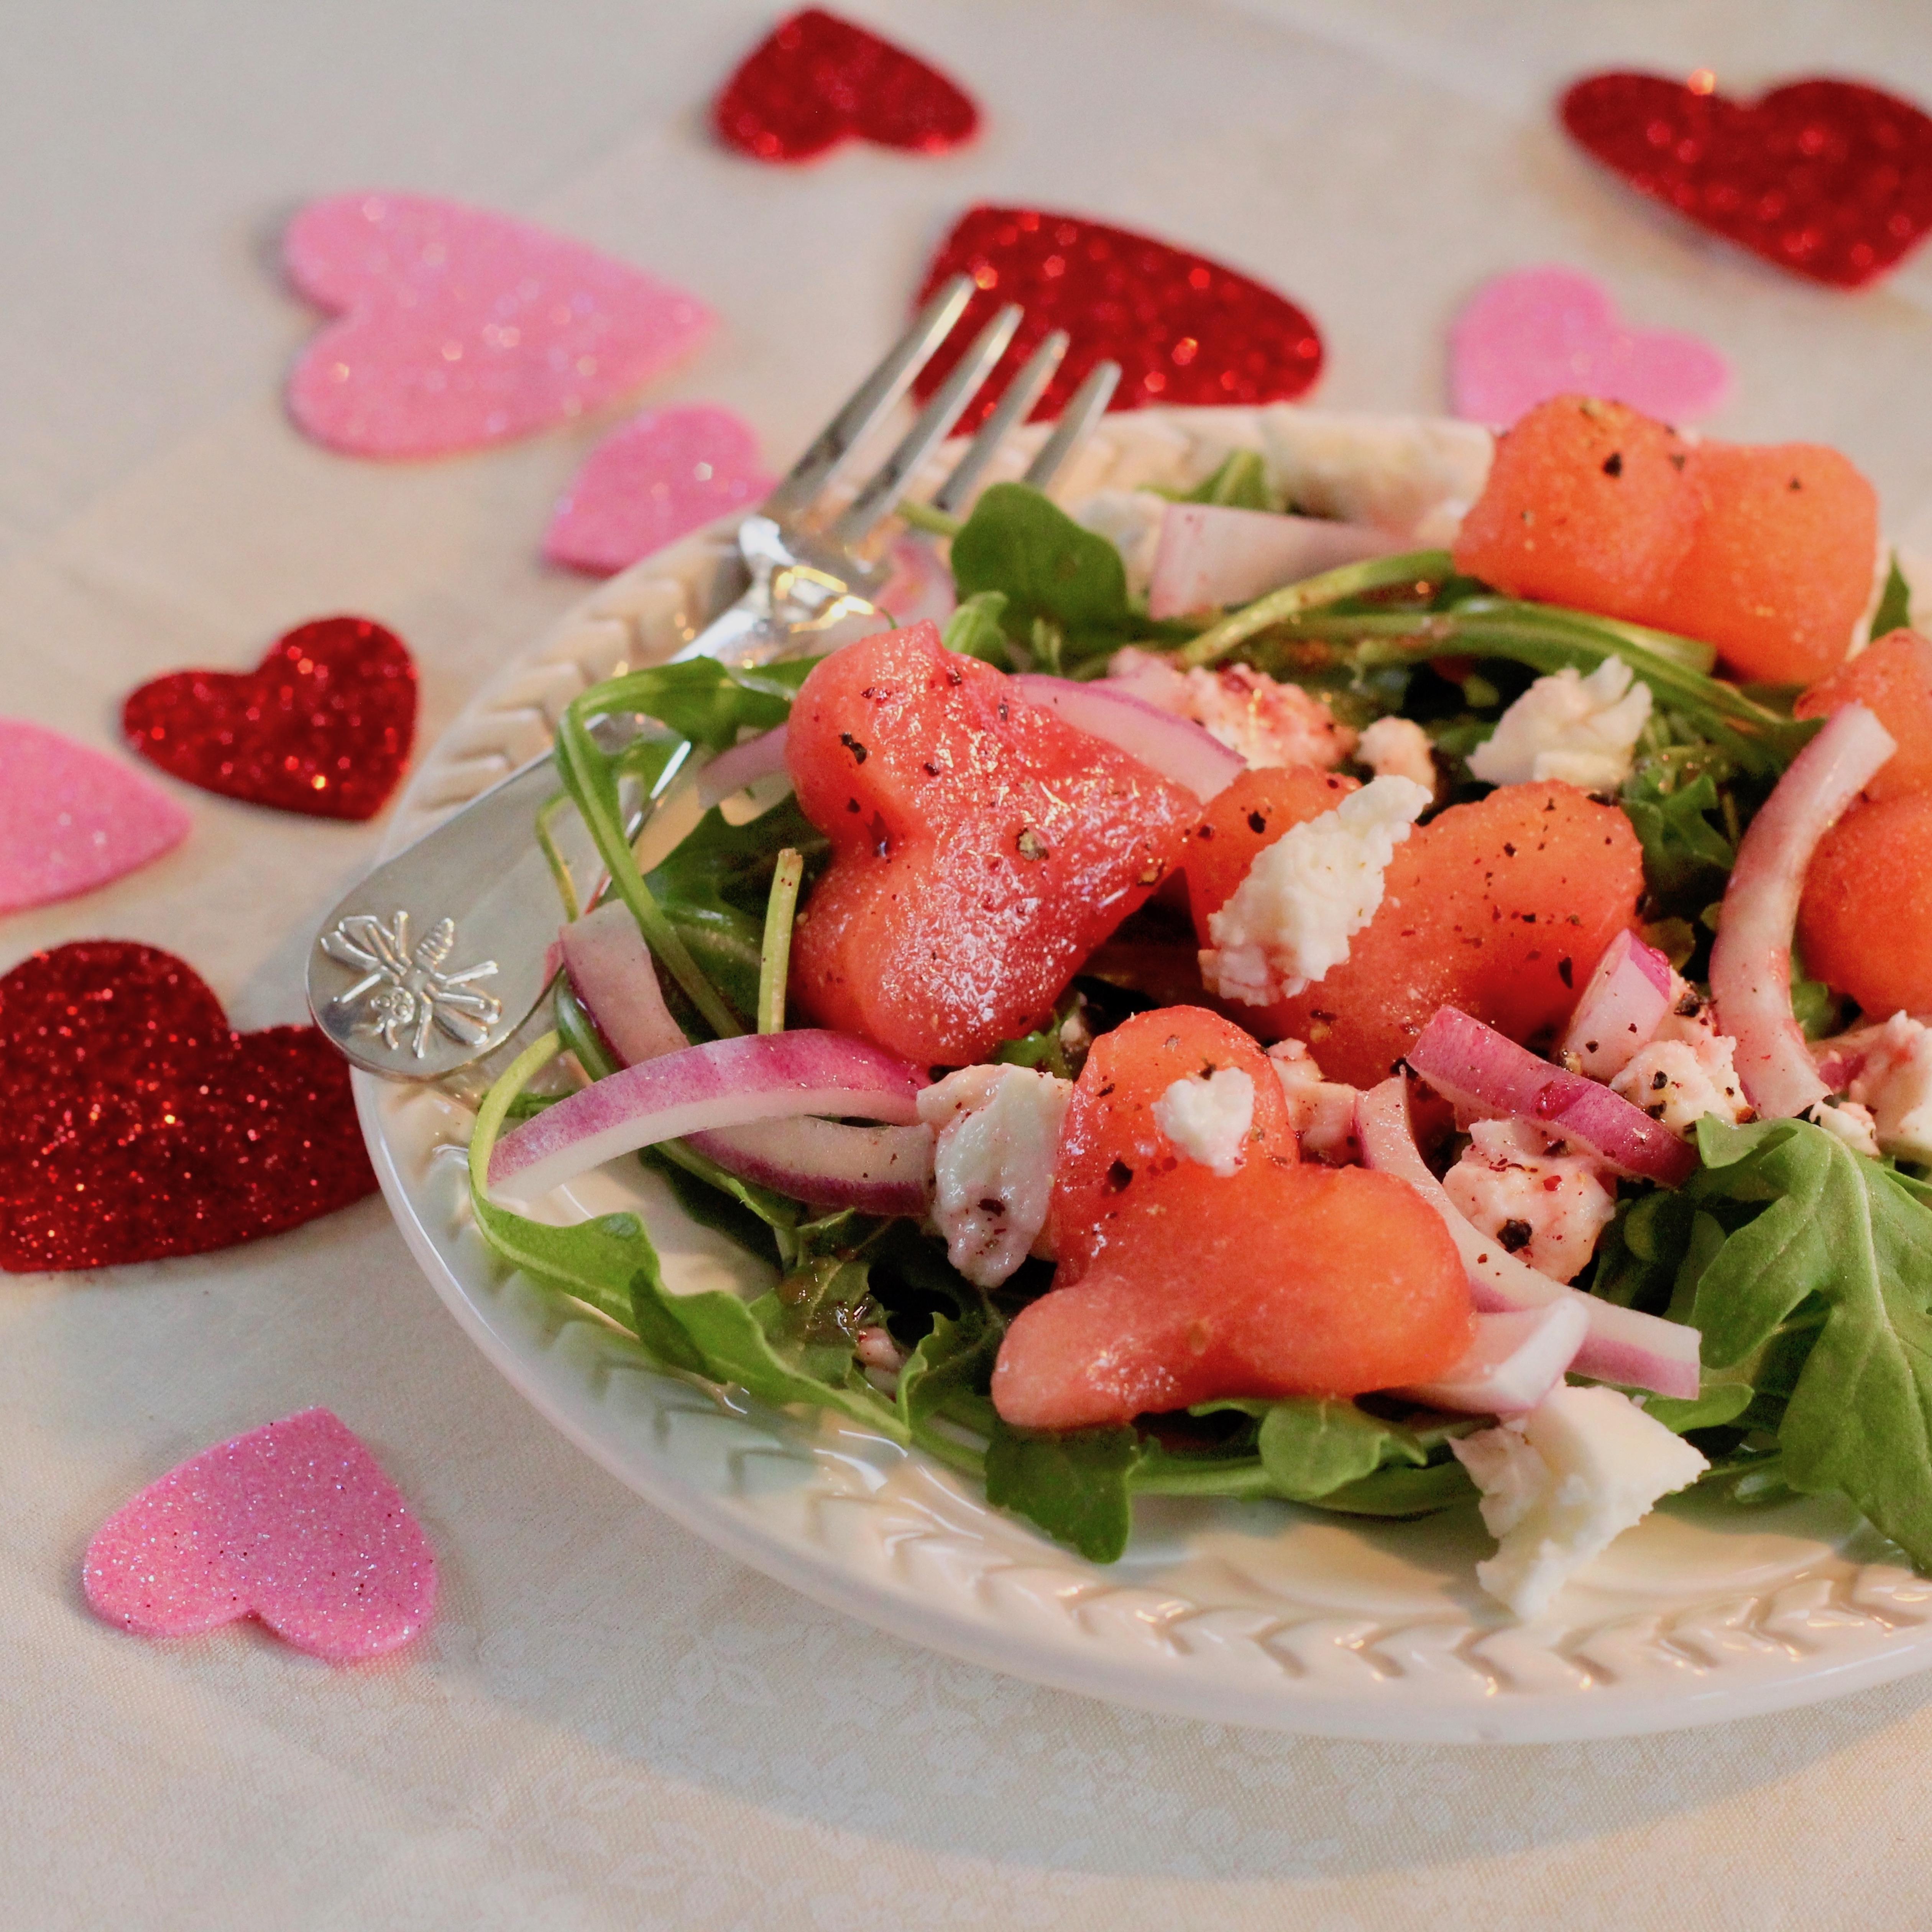 Arugula and Watermelon Salad lutzflcat